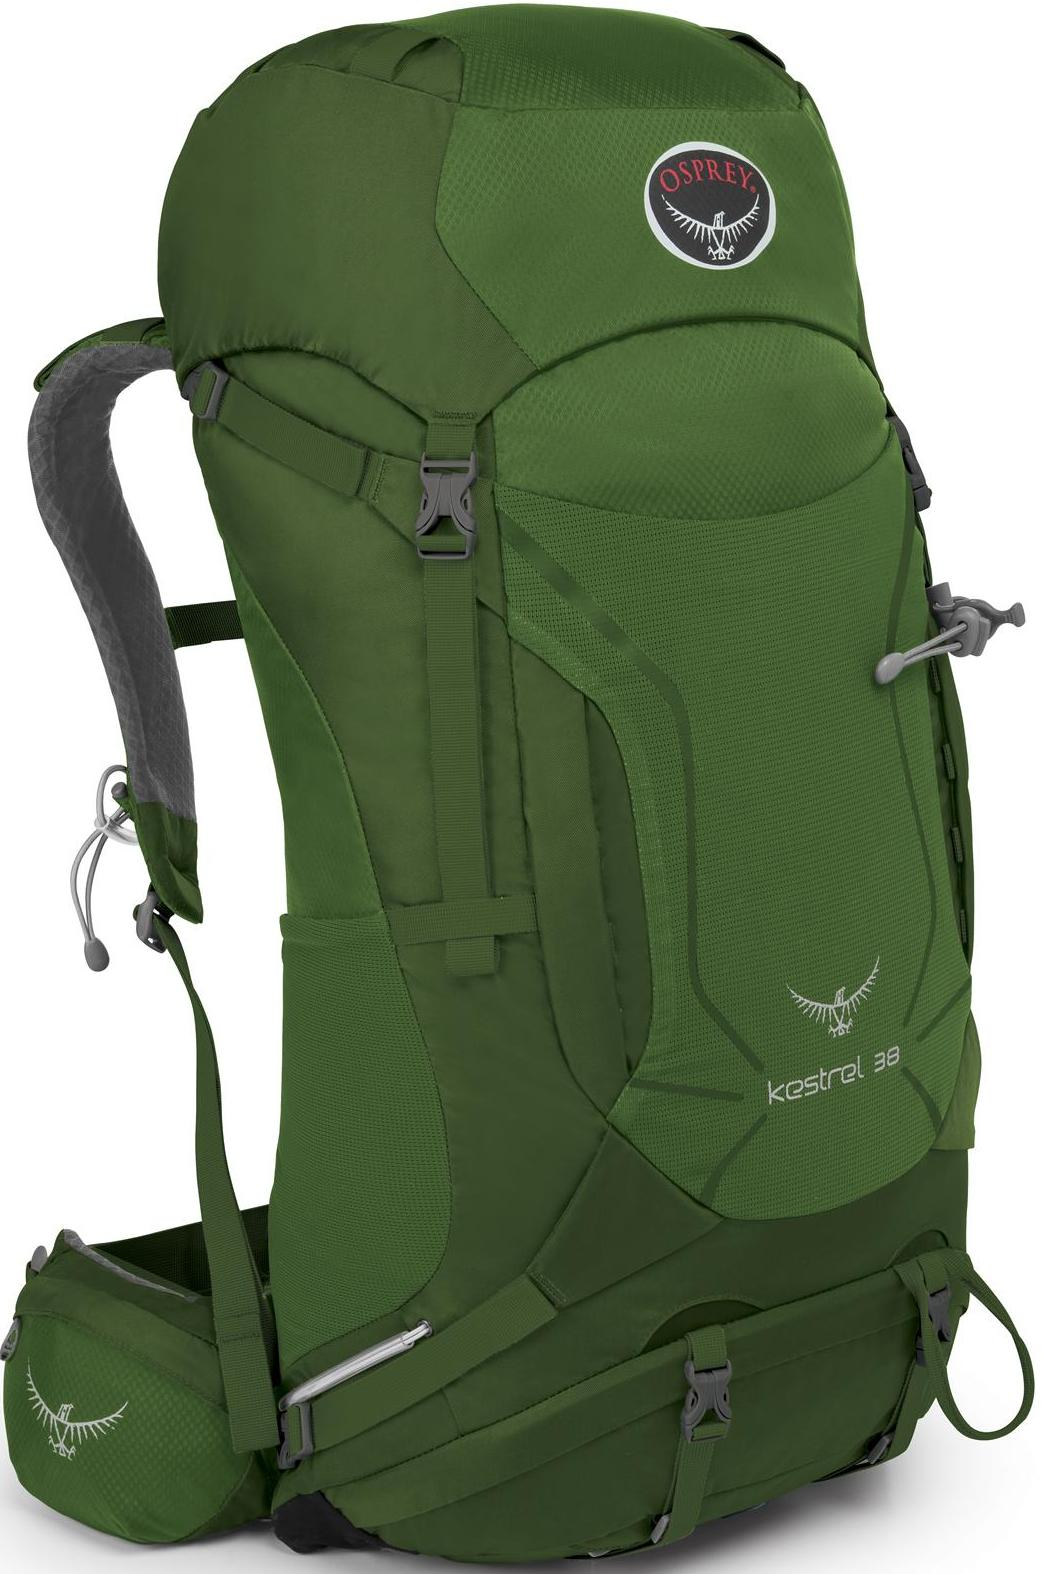 Osprey Kestrel 38 小鷹輕量登山背包/健行背包 附贈背包套 新款 38升 叢林綠/台北山水